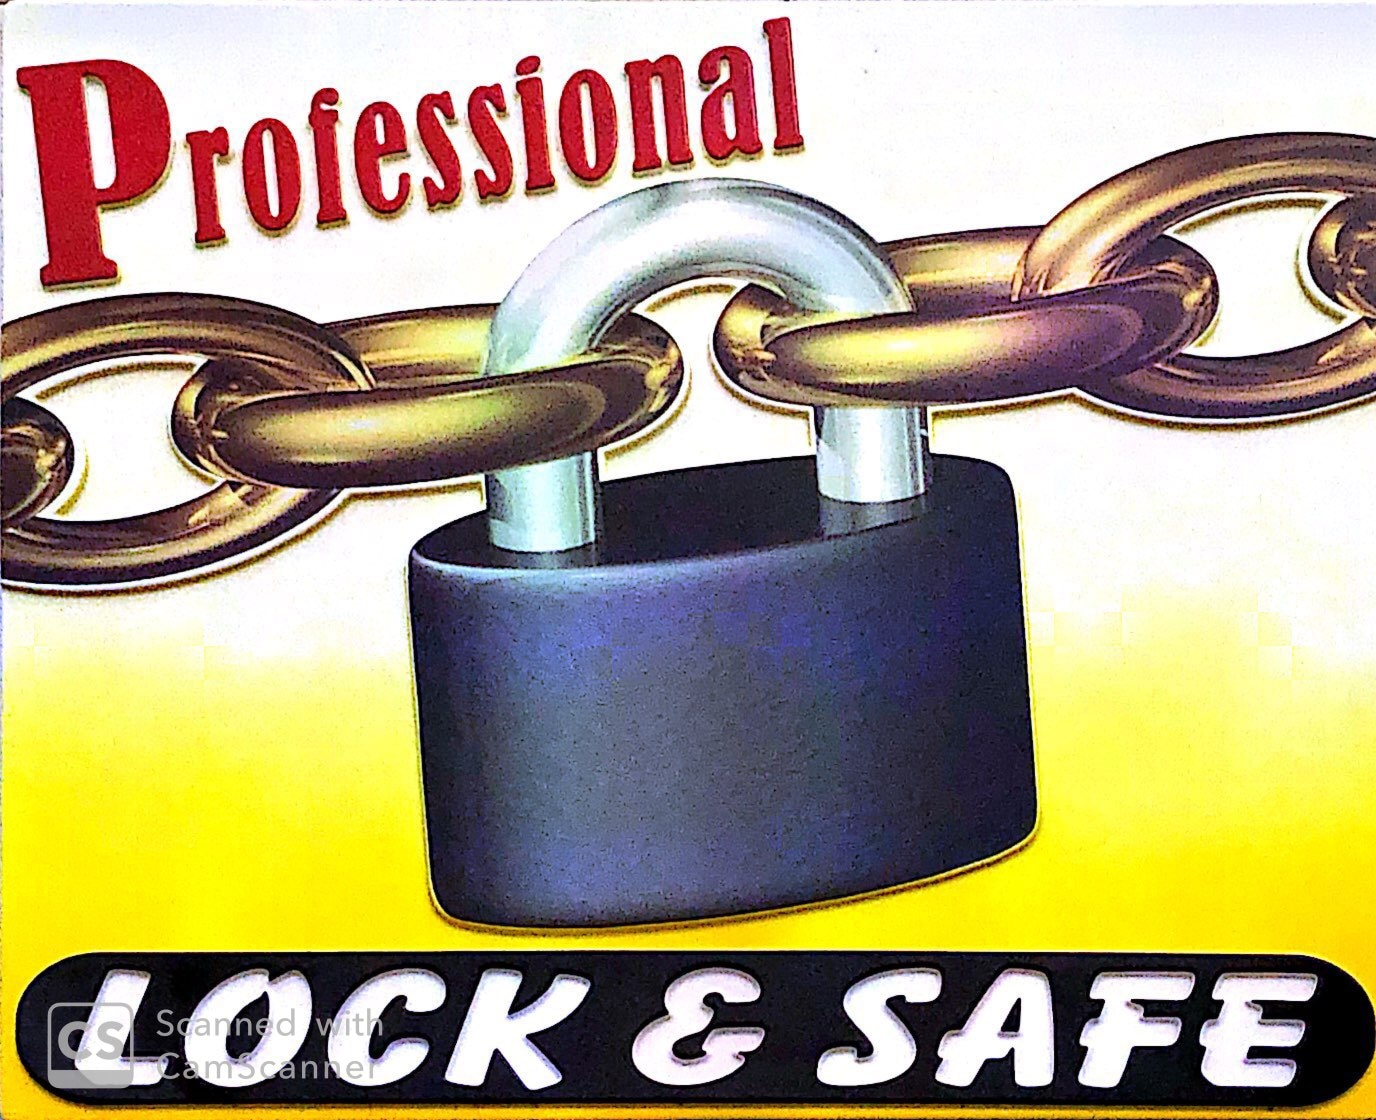 PROFESSIONAL LOCK & SAFE CO INC